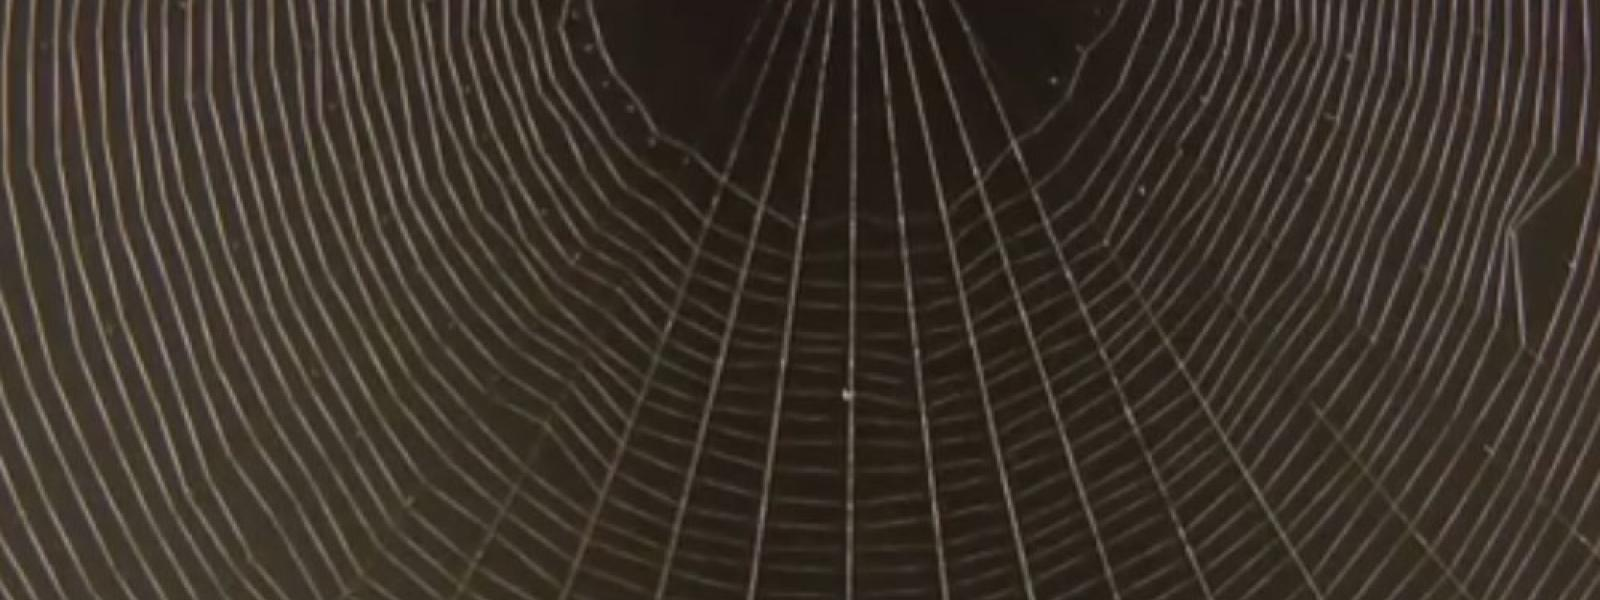 spider web hero